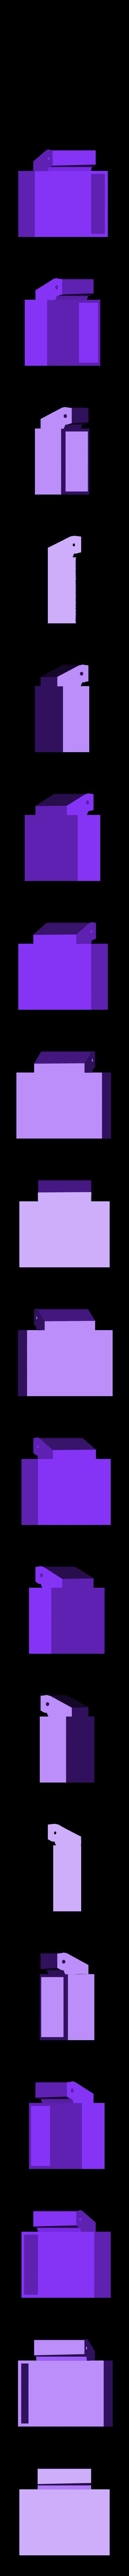 Littleboxbox.stl Download free STL file Box with hinge • 3D printable design, Minweth